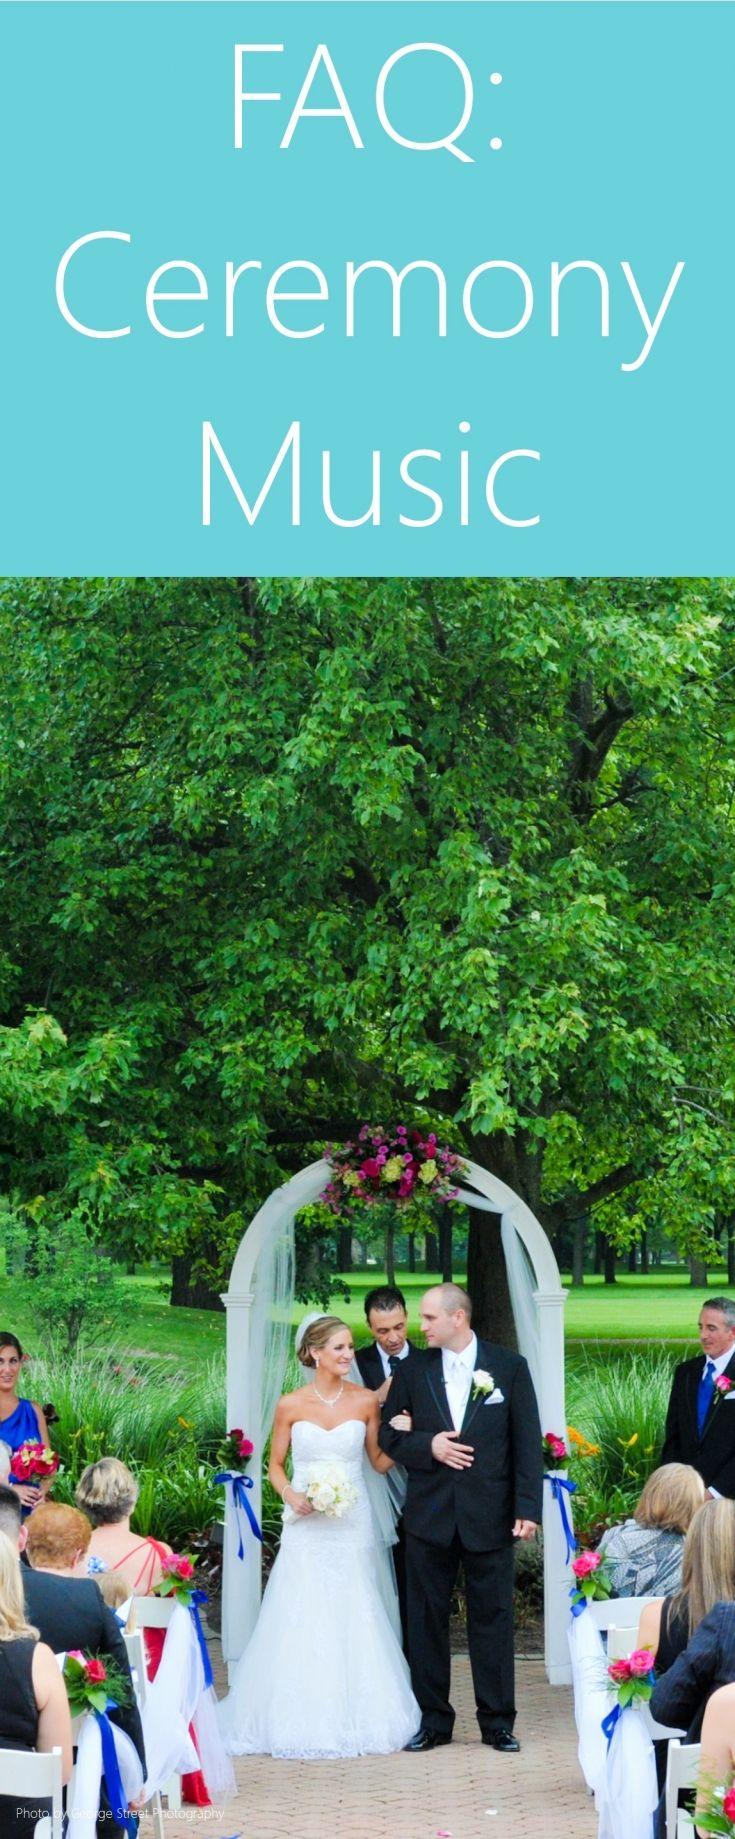 12 best Wedding Ceremony Music images on Pinterest